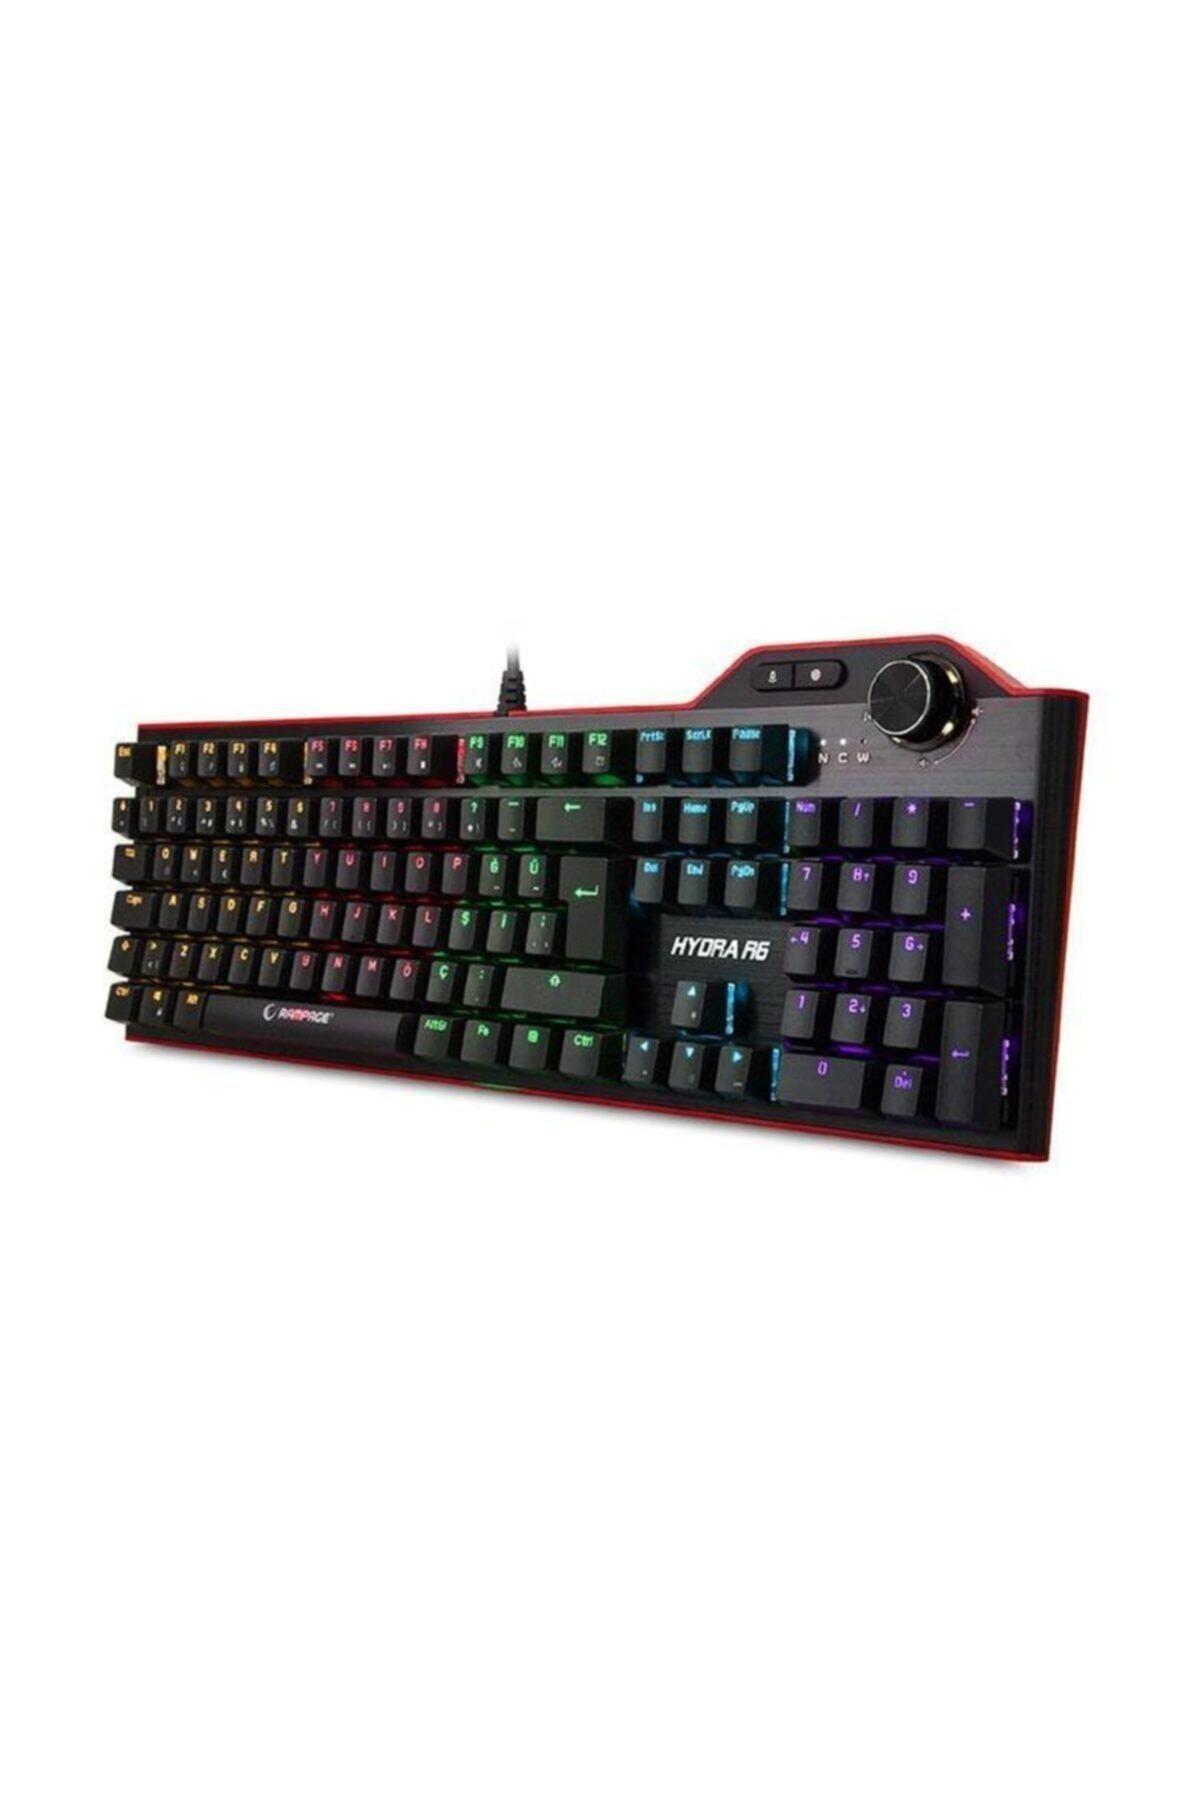 Everest Rampage Hydra R6 Full Color Rgb Led Gaming Pro Blue Switch Aluminyum Kaplama Multimedia Klavye 2